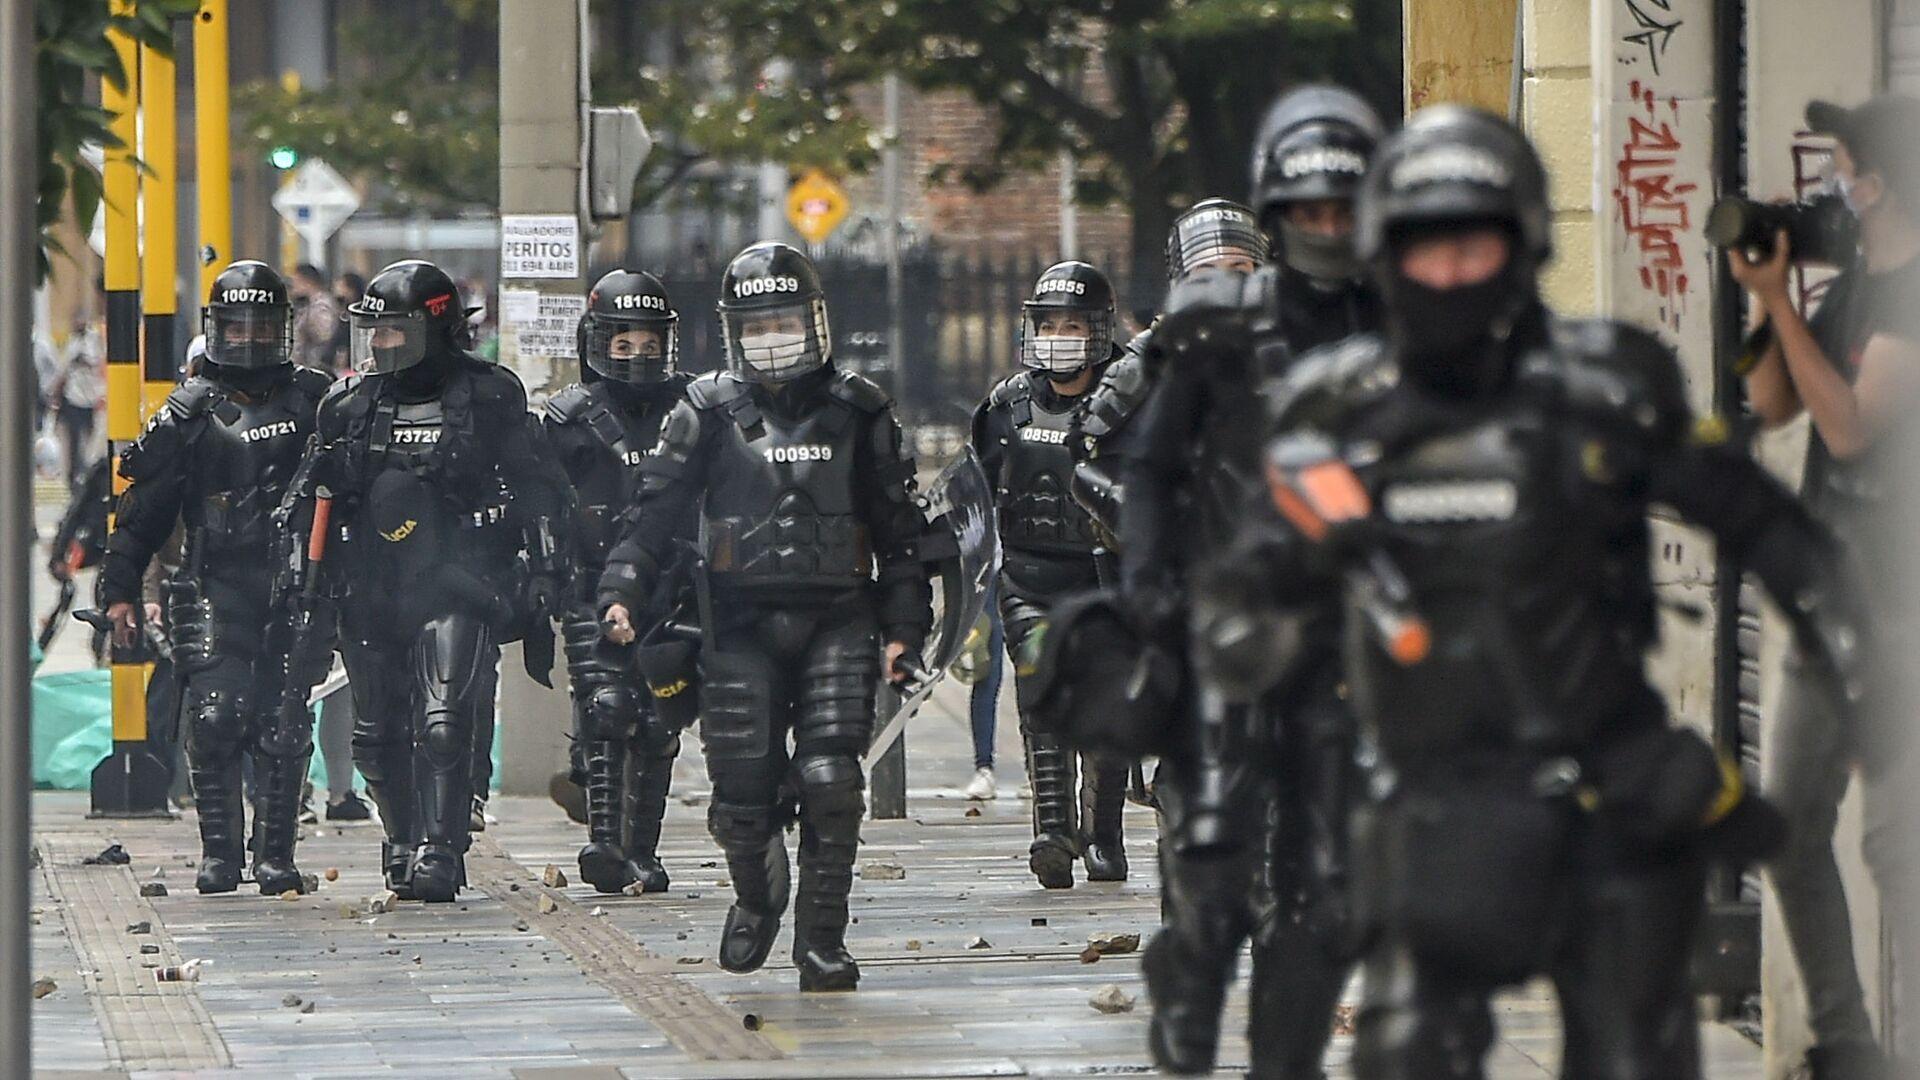 Polizia antisommossa a Bogotá, Colombia - Sputnik Italia, 1920, 30.08.2021